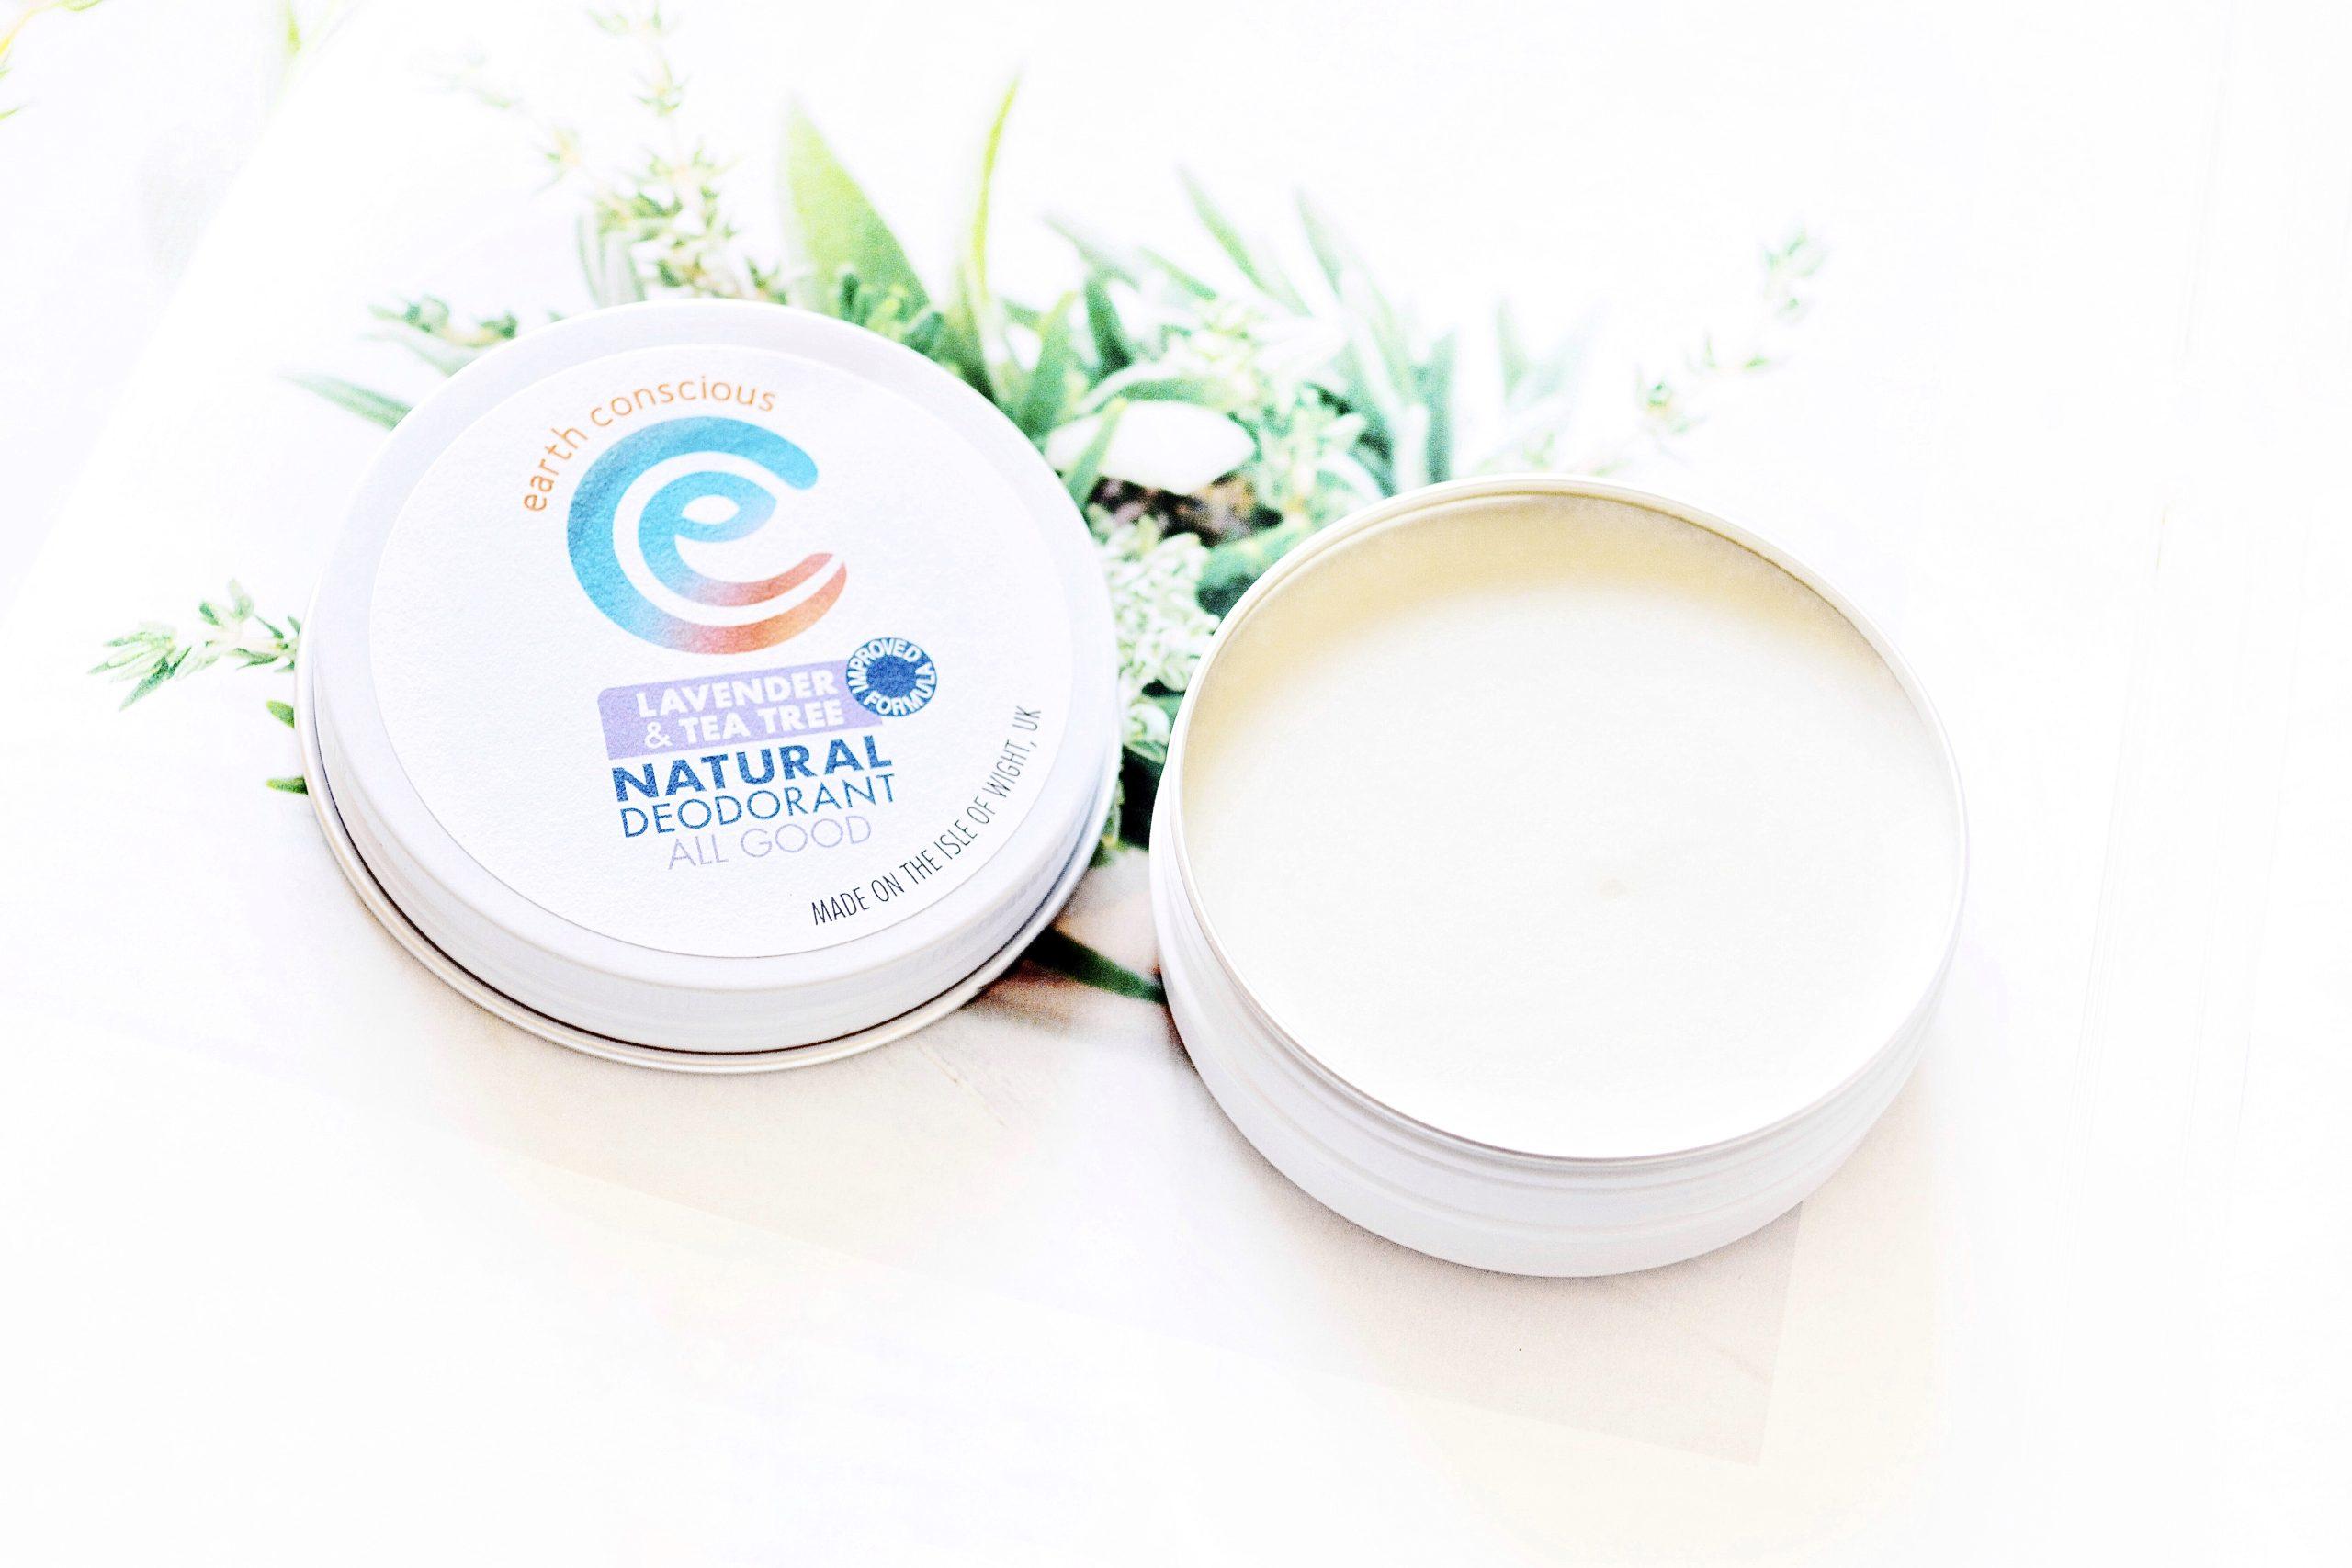 Earth Conscious Lavender & Tea Tree Natural Deodorant review